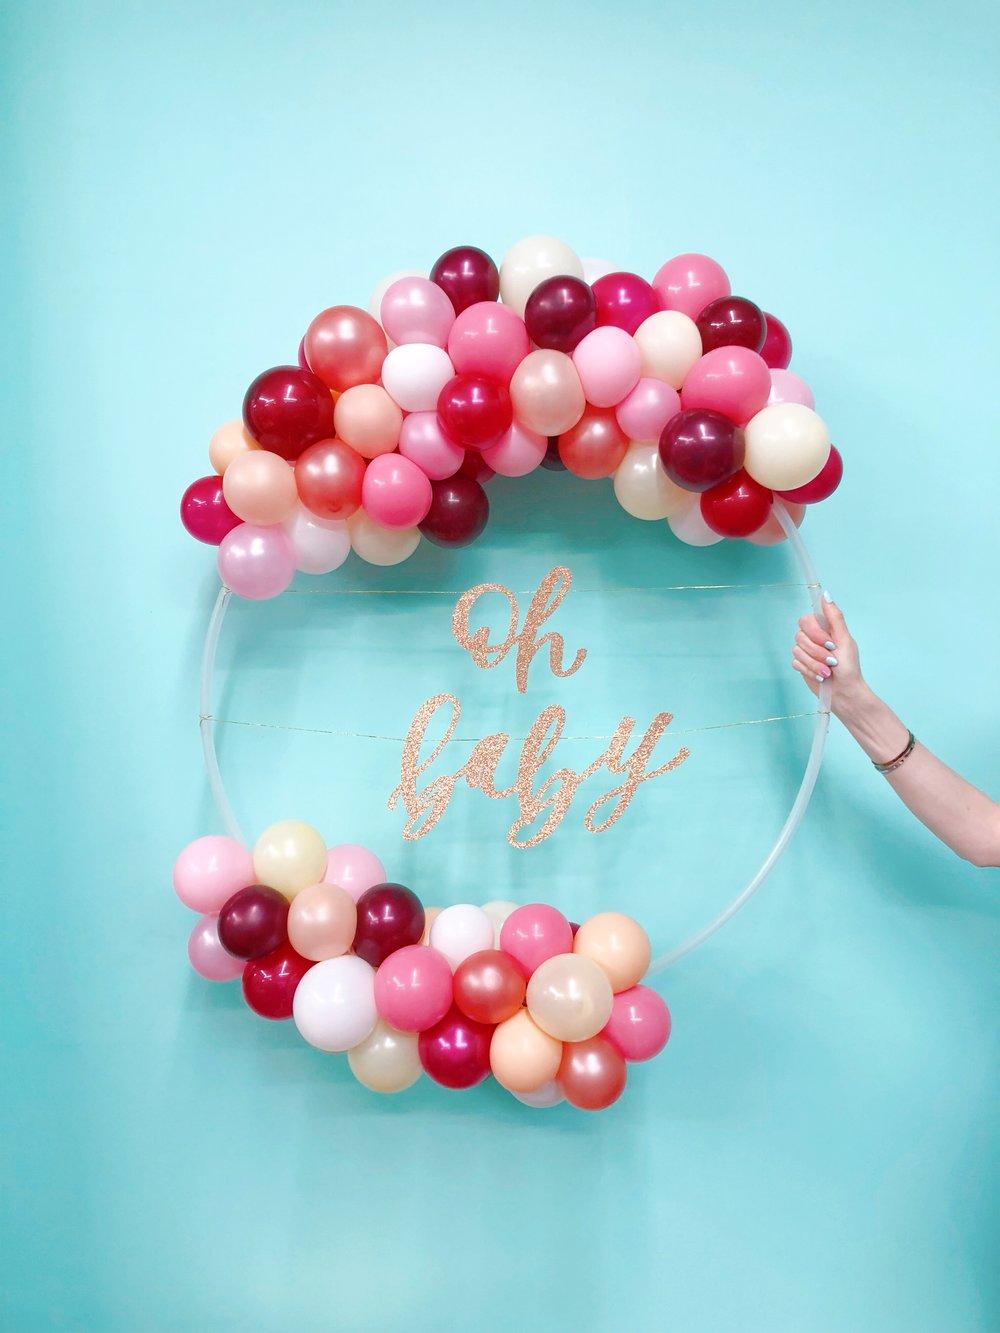 vroom_vroom_balloon_wreath_oh_baby_shower_girsl_pink.JPG